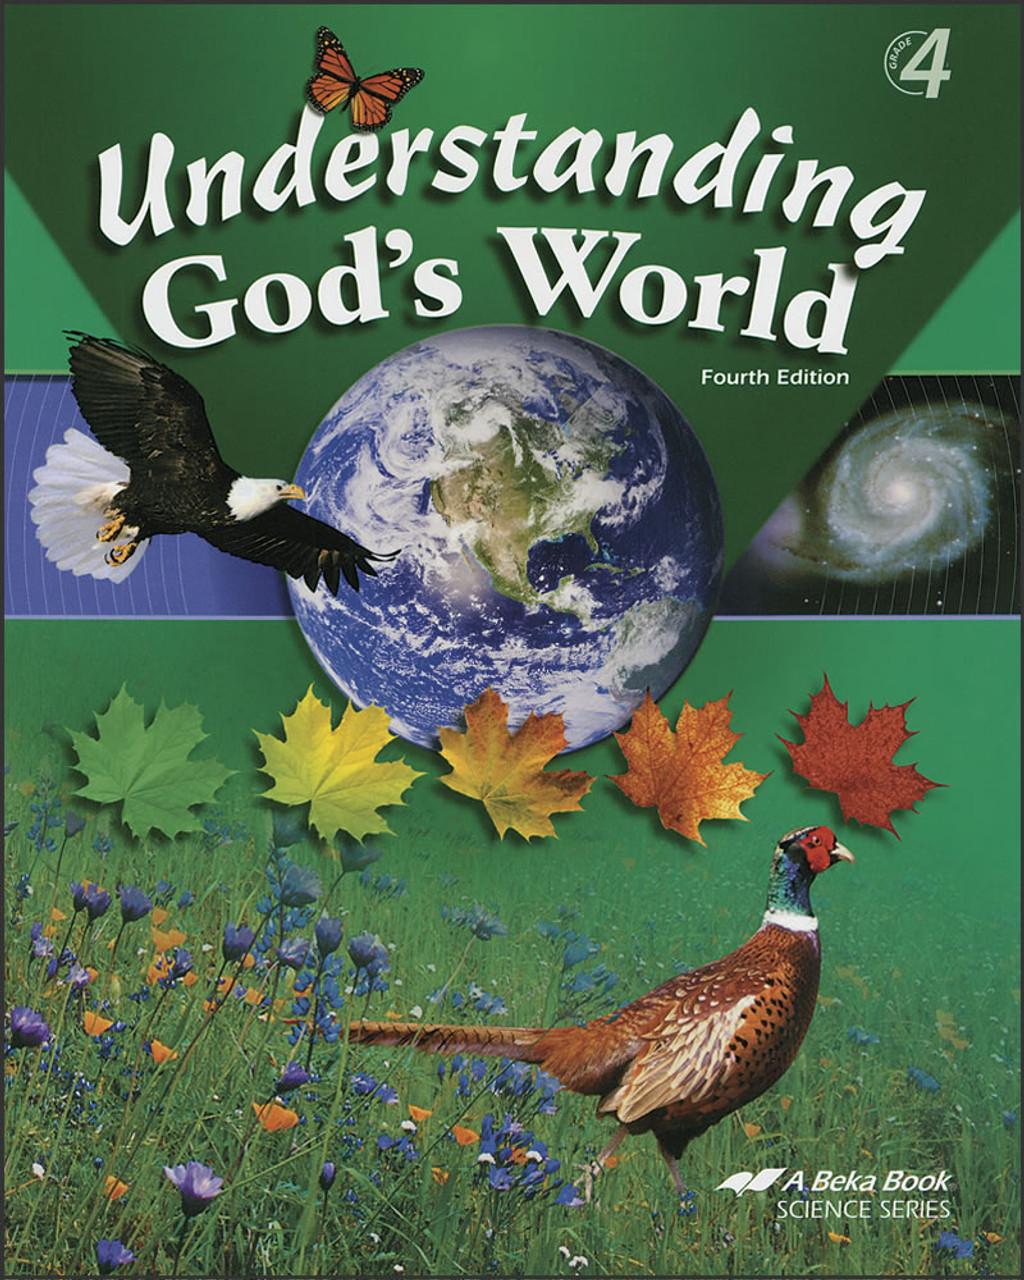 Understanding God's World, 4th edition